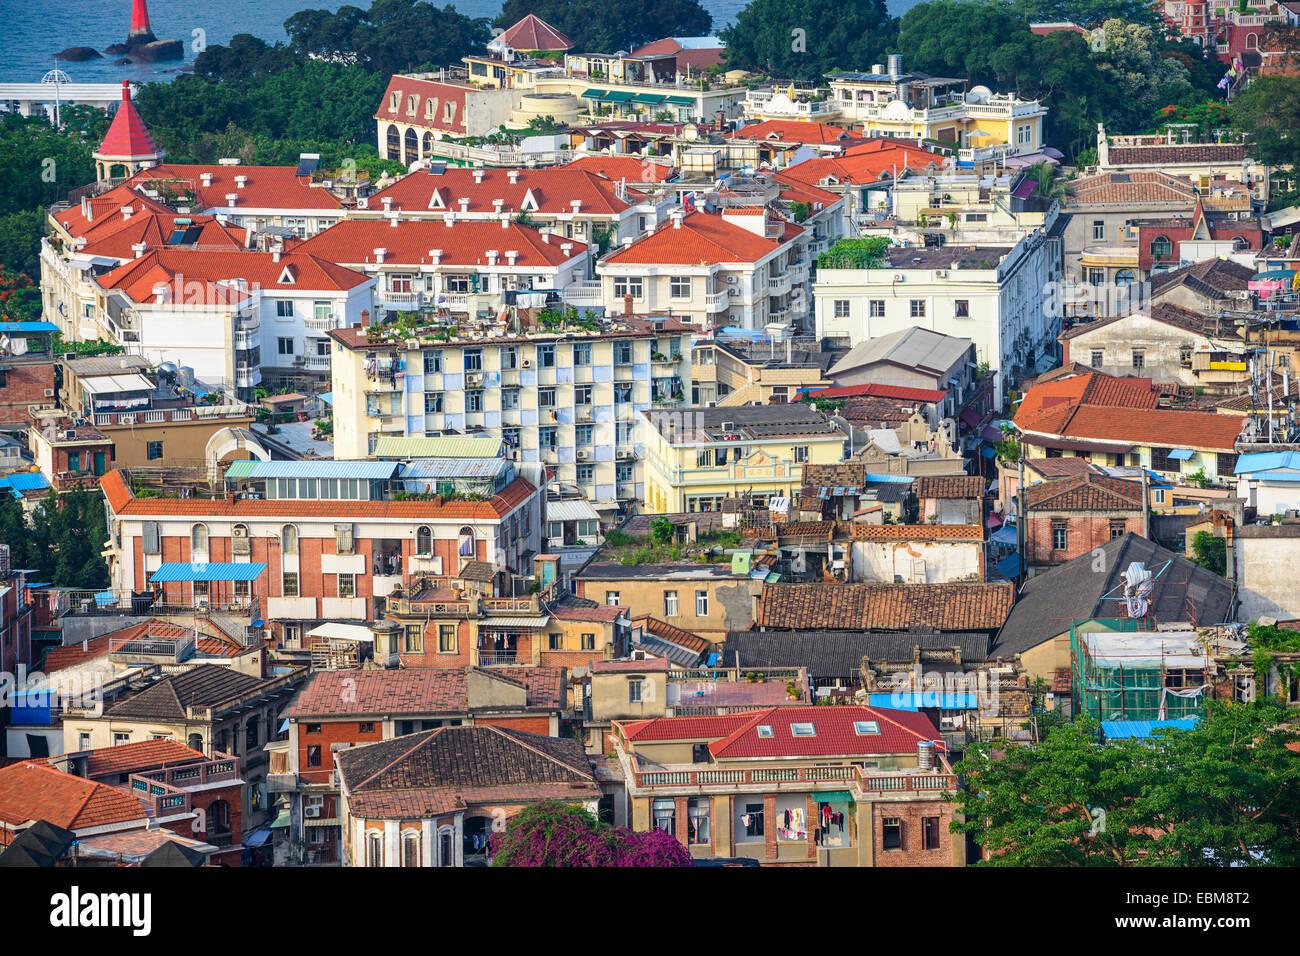 Xiamen, China cityscape of historic buildings on Gulangyu Island. - Stock Image